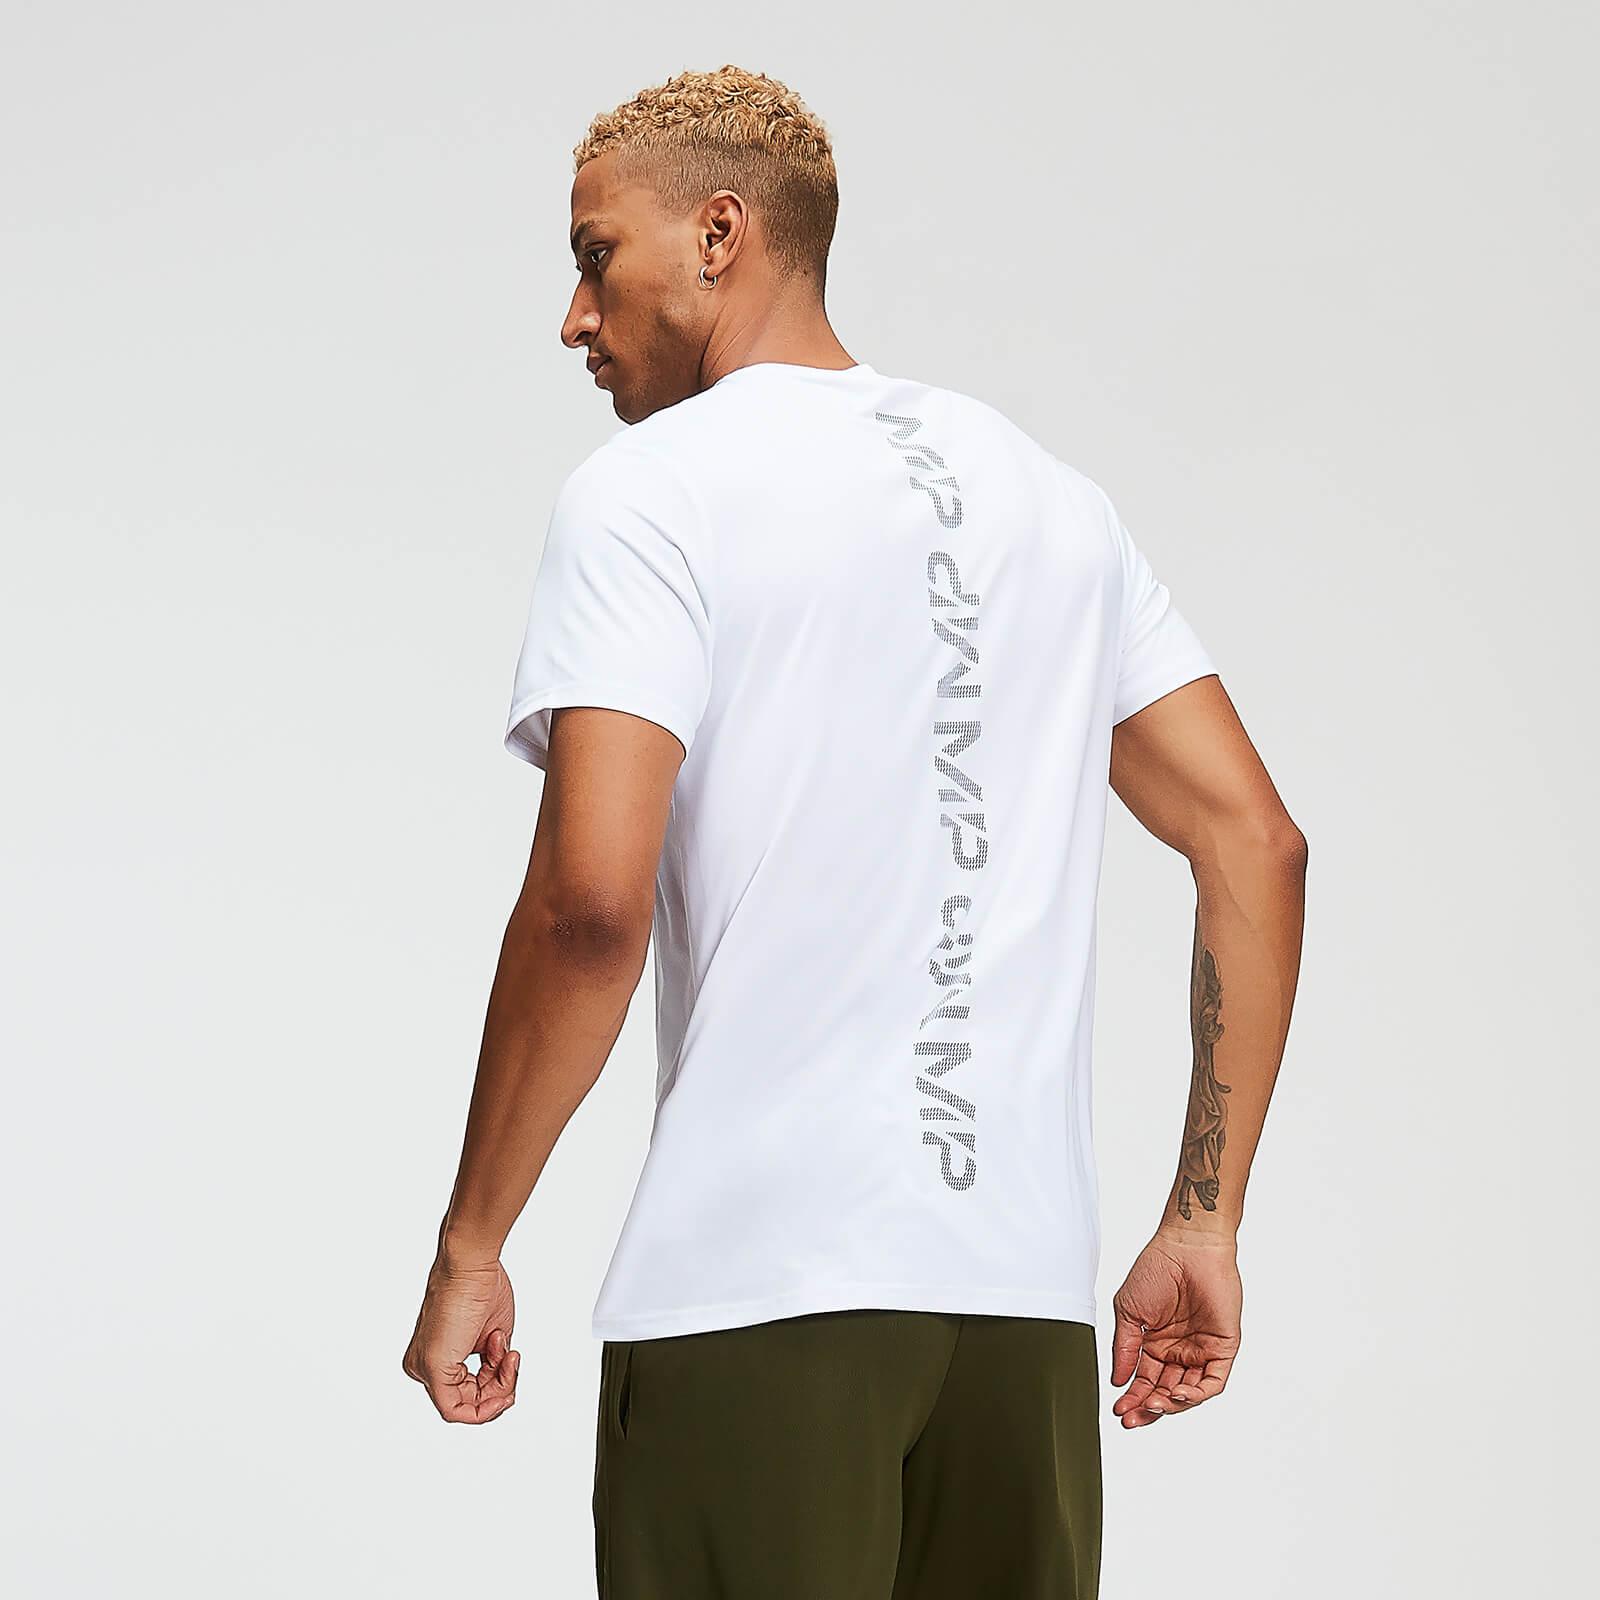 Myprotein MP Training Men's T-Shirt - White - S